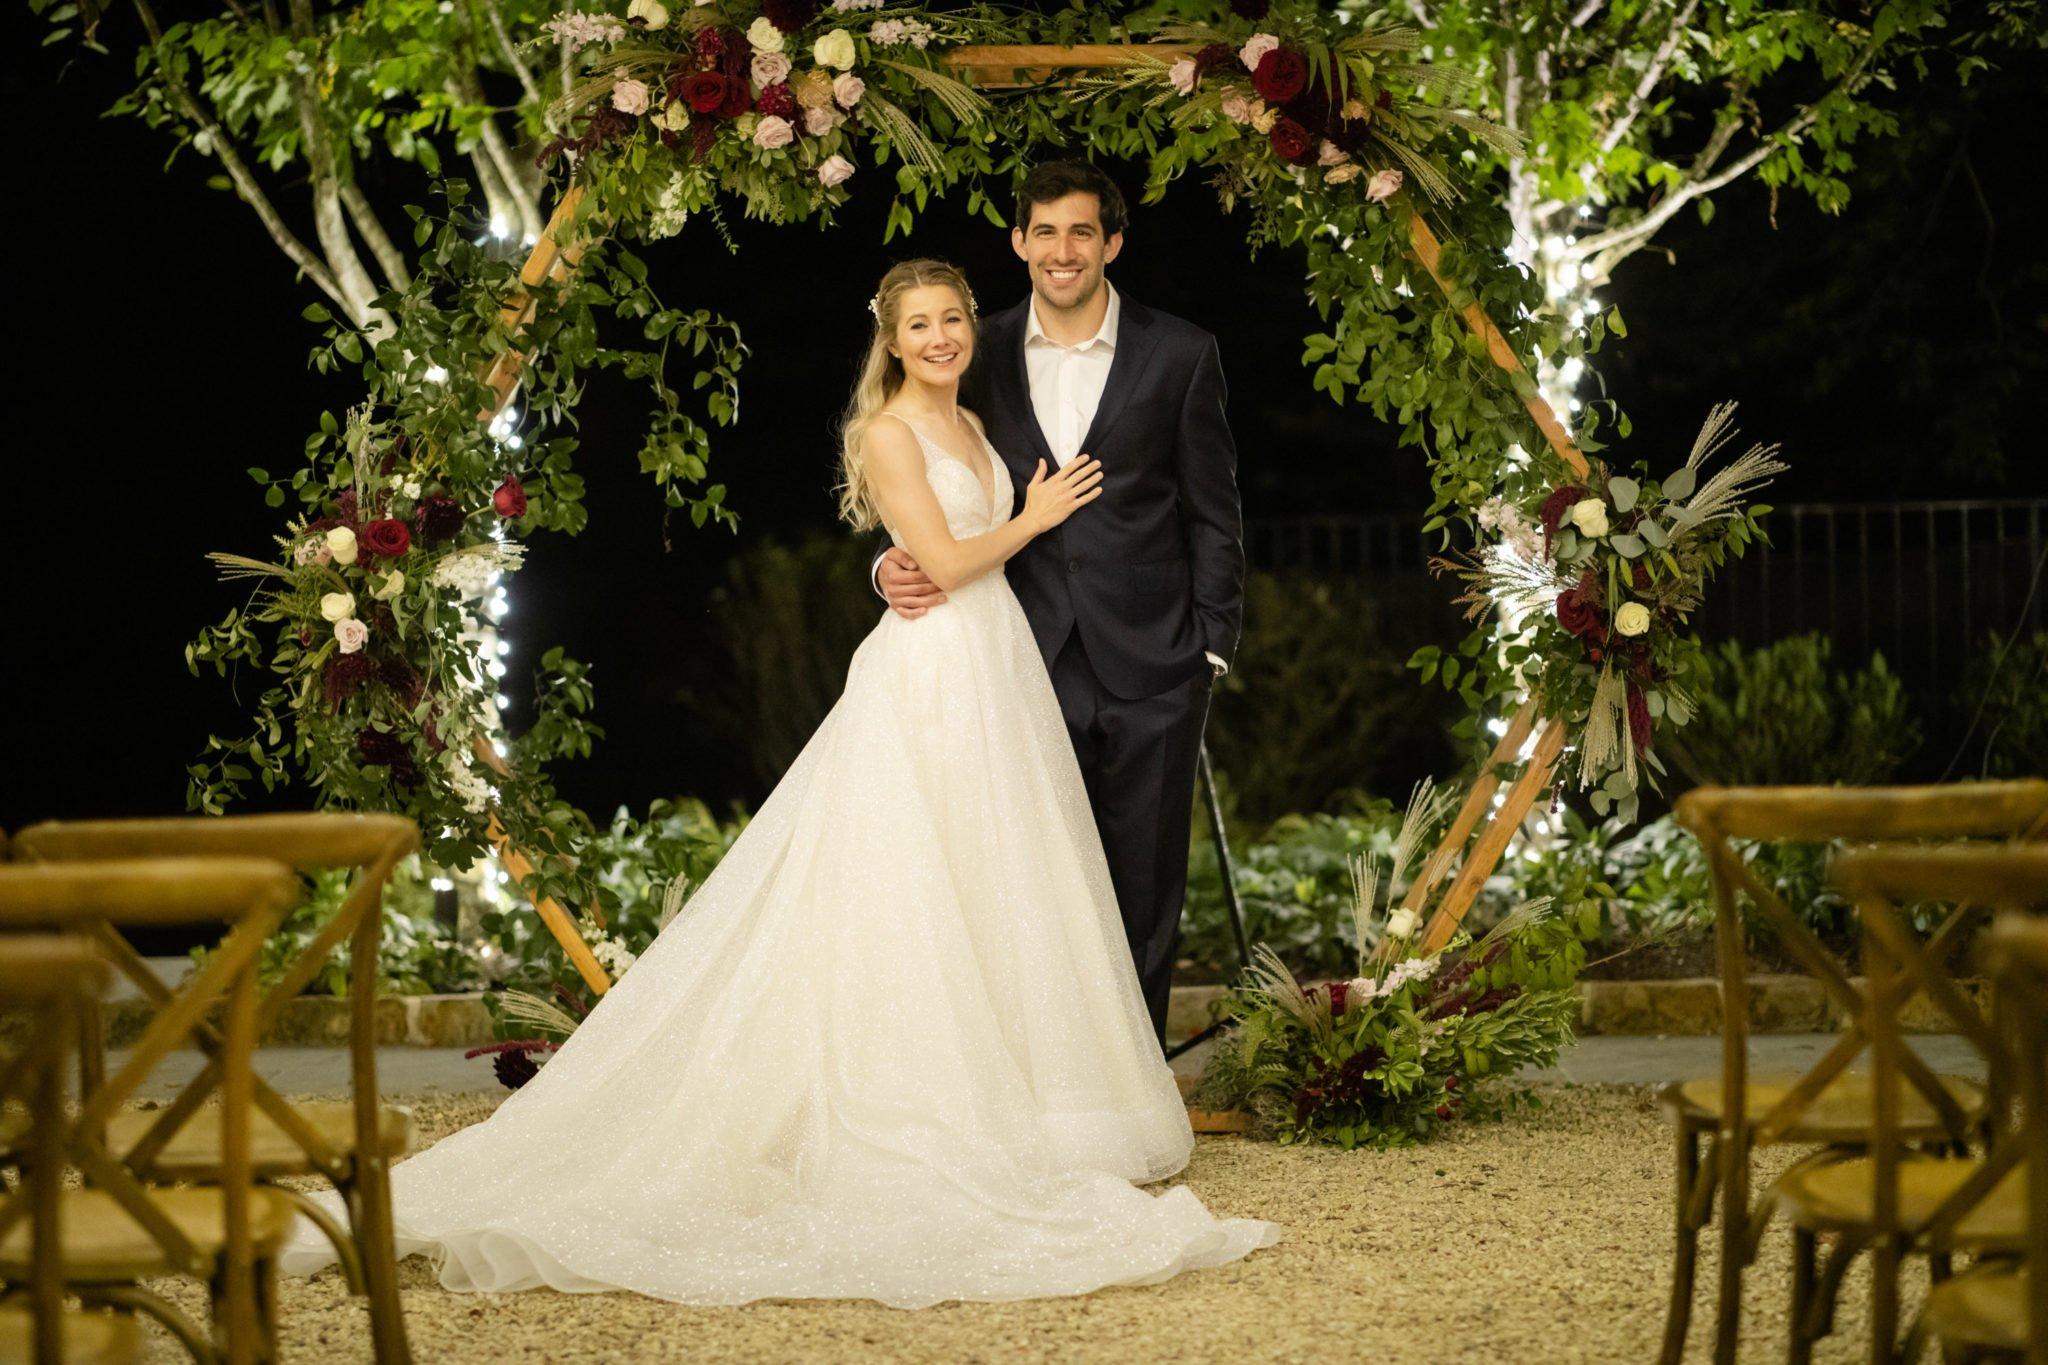 StefanieKamermanPhotography-MelanieandBenjamin-Wedding-Bethesda,MD-2019-10-12-325